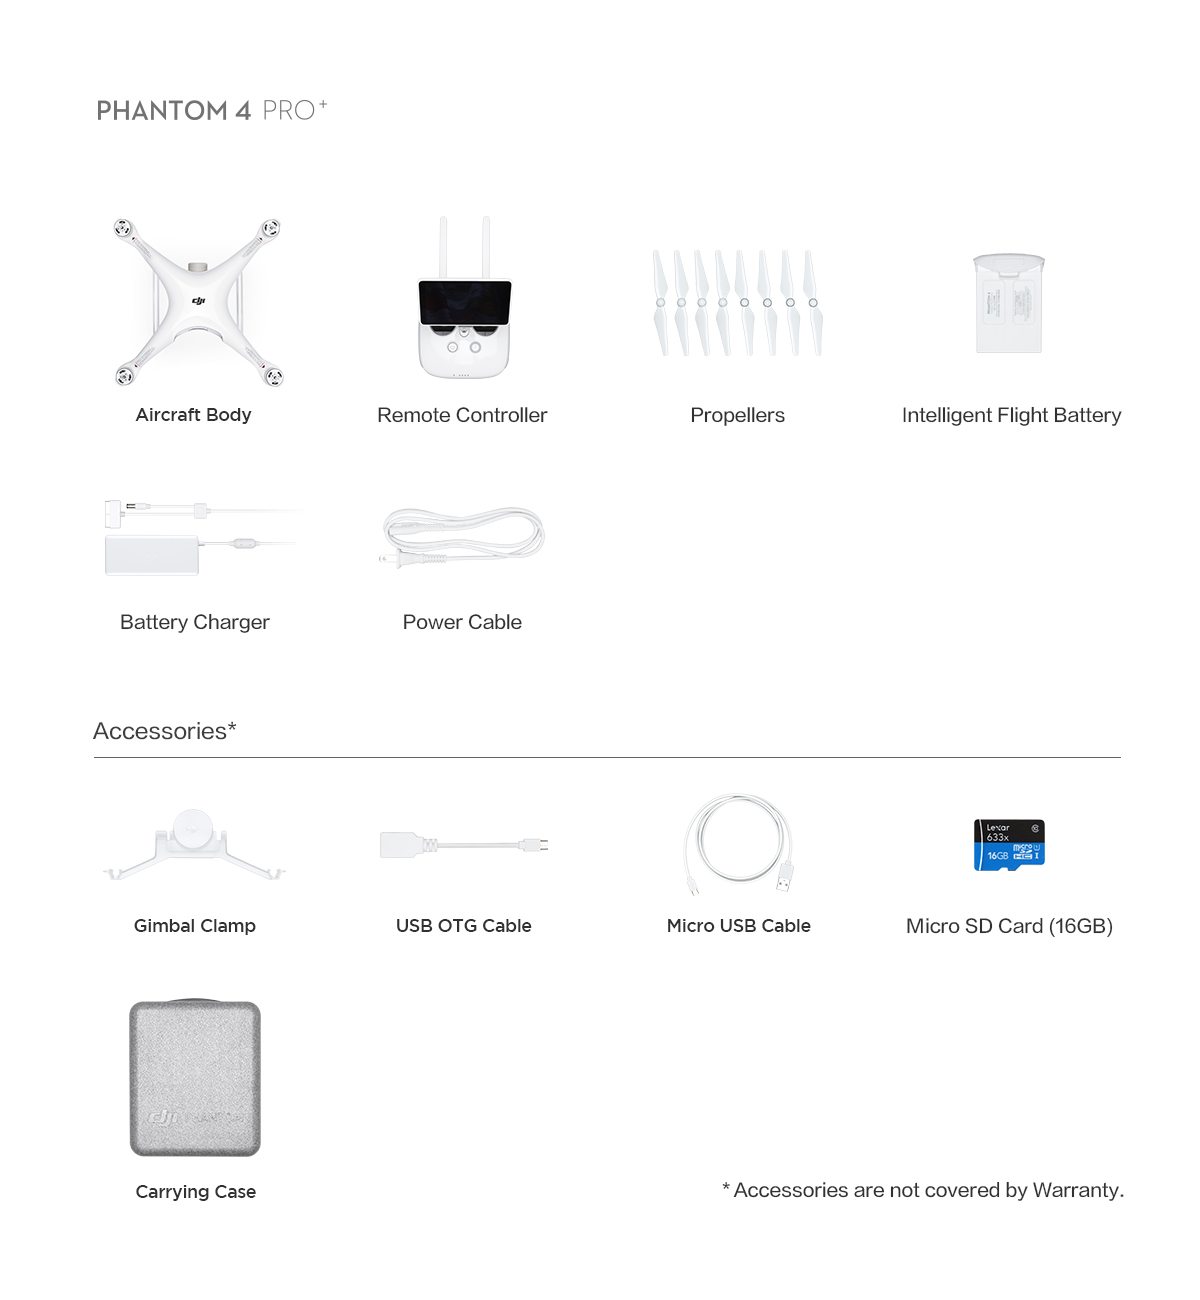 p4 pro+ box contents